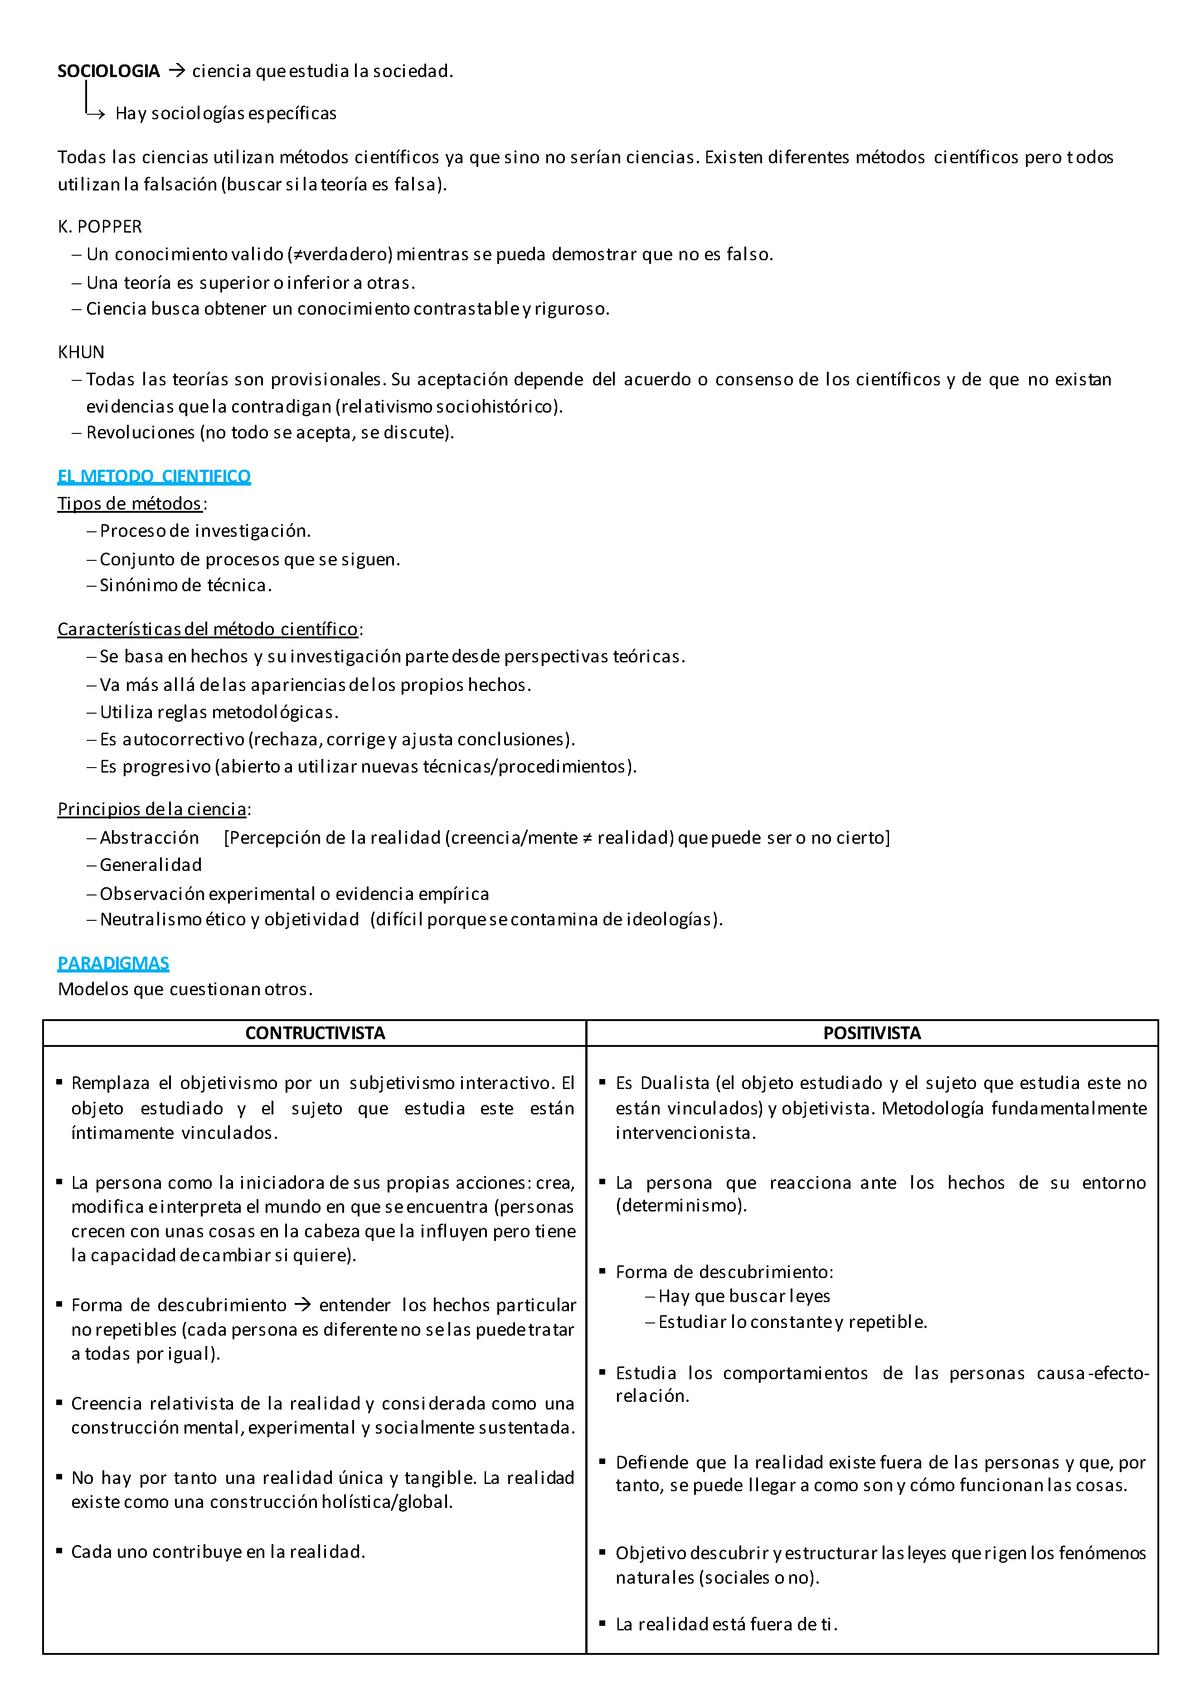 Apunts Sociologia Eduardo Resbier 363658 Ub Studocu